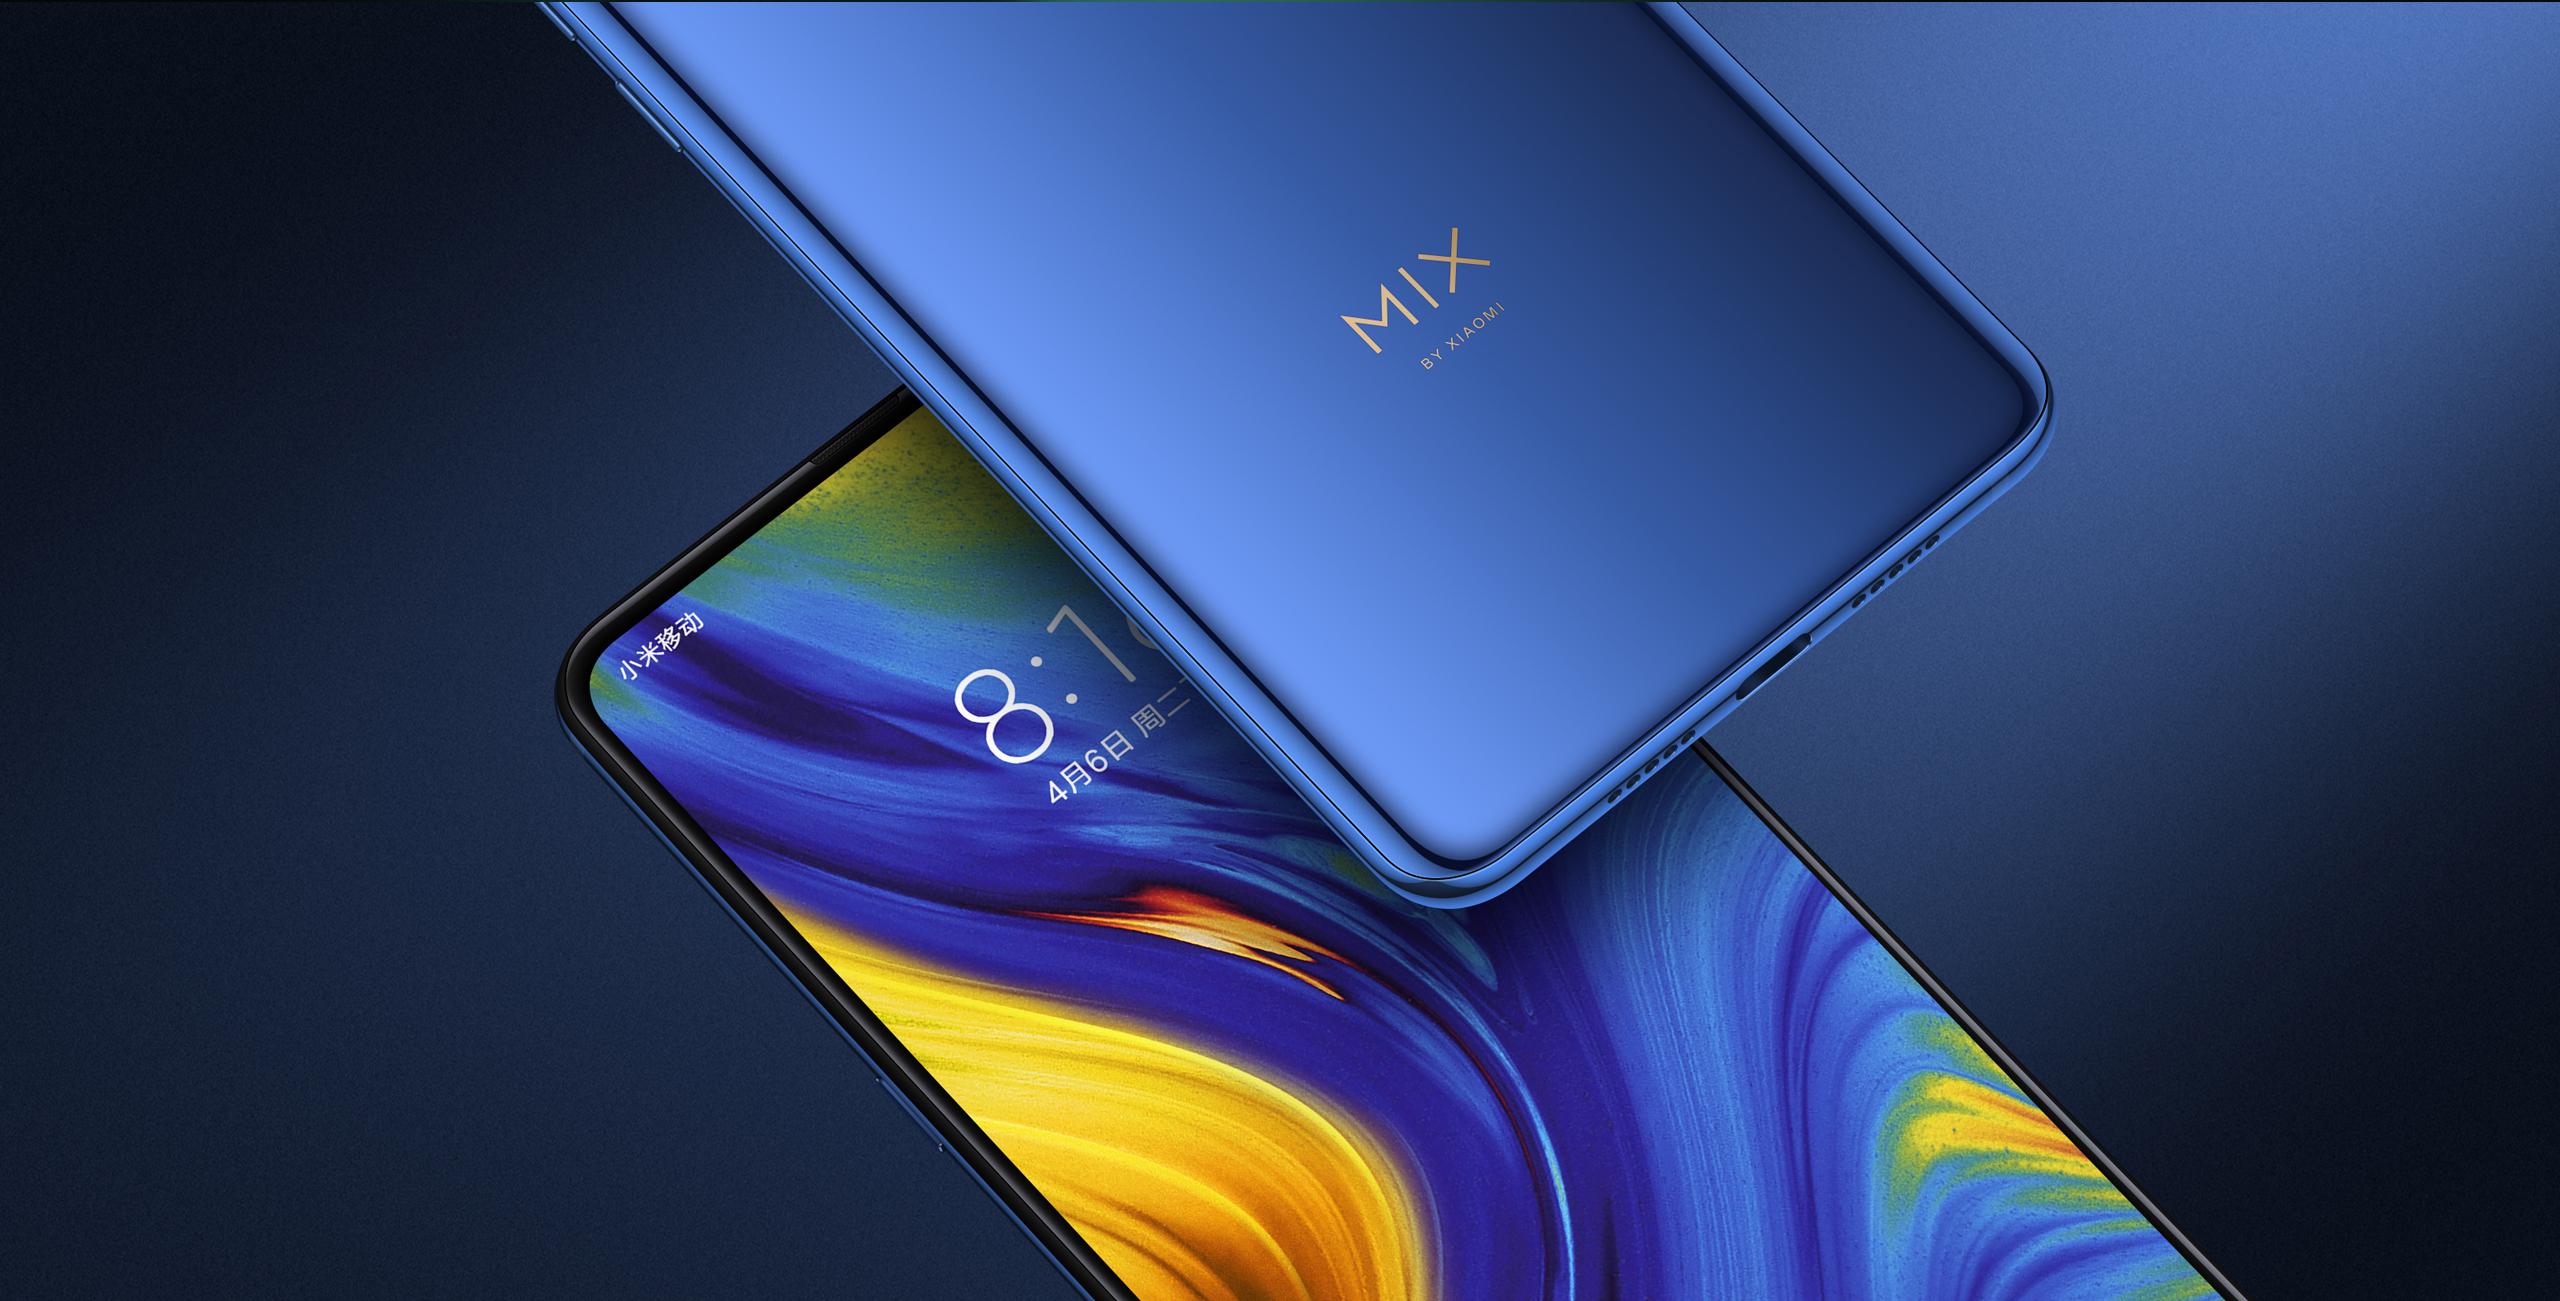 Mi MIX 3 okostelefon - 8+128GB, zafírkék